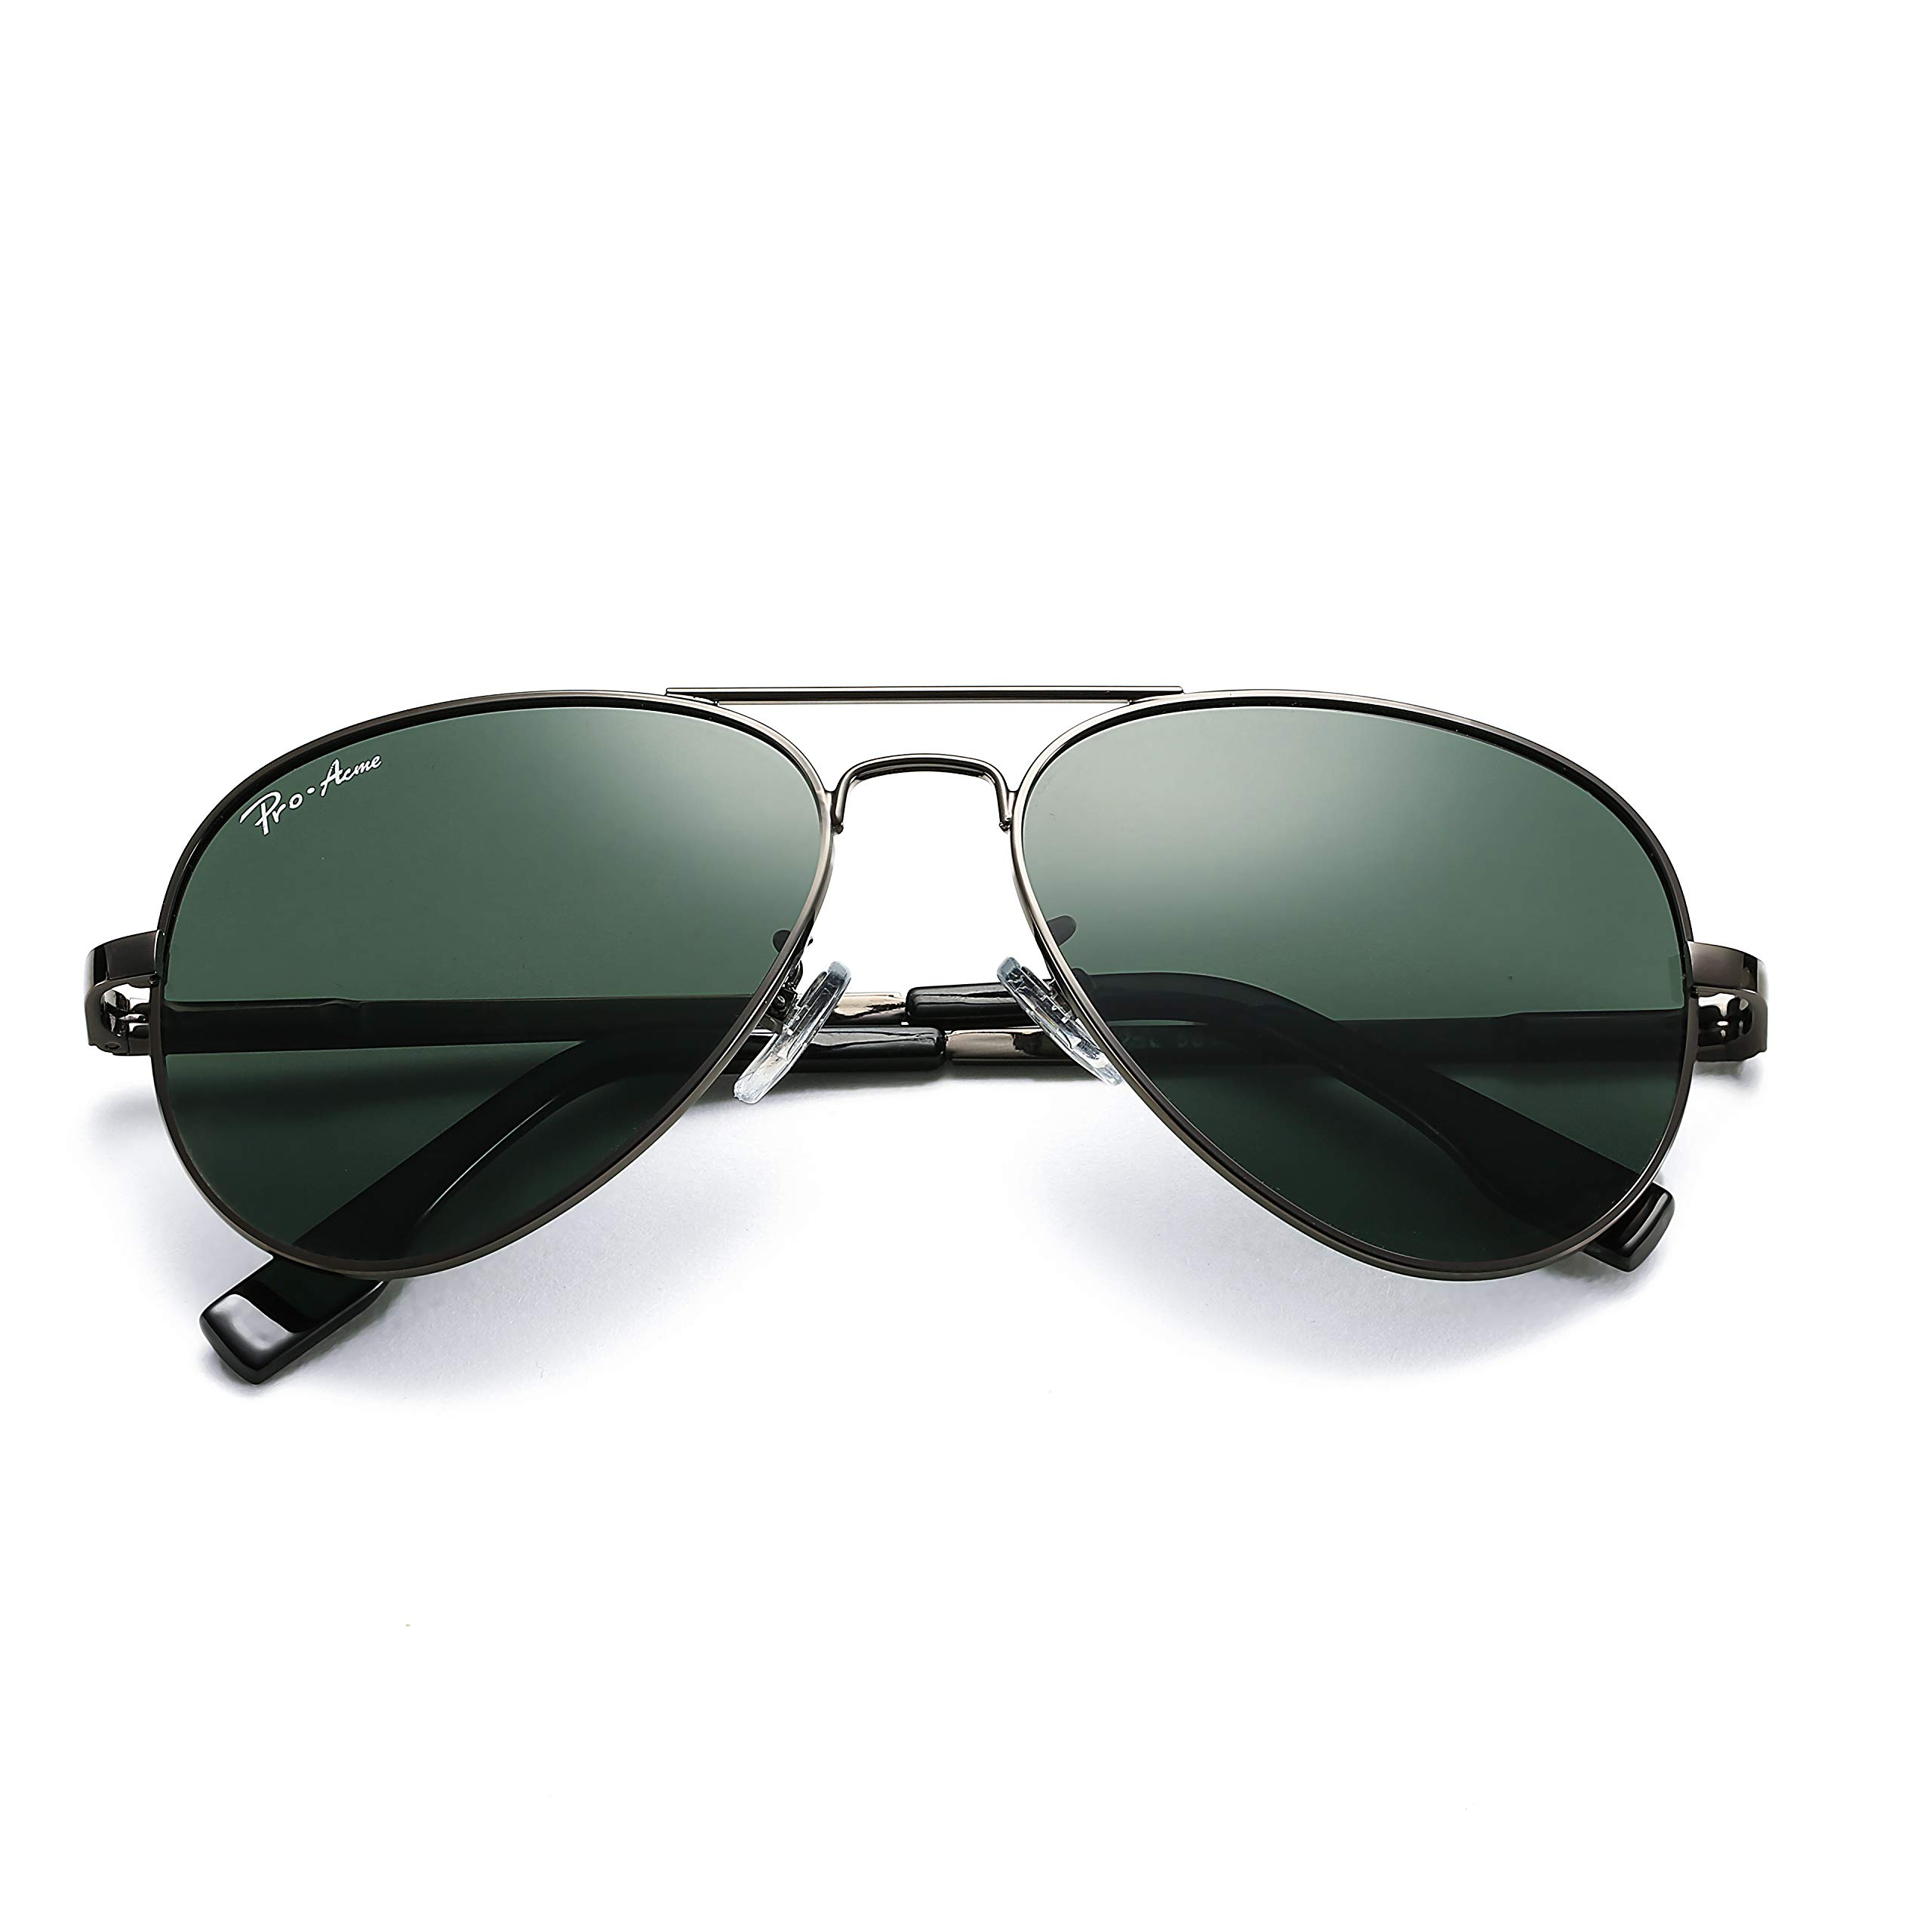 Pro Acme Polarized Aviator Sunglasses for Men and Women 100% UV Protection, 58mm (Gunmetal Frame/G15 Lens) by Pro Acme